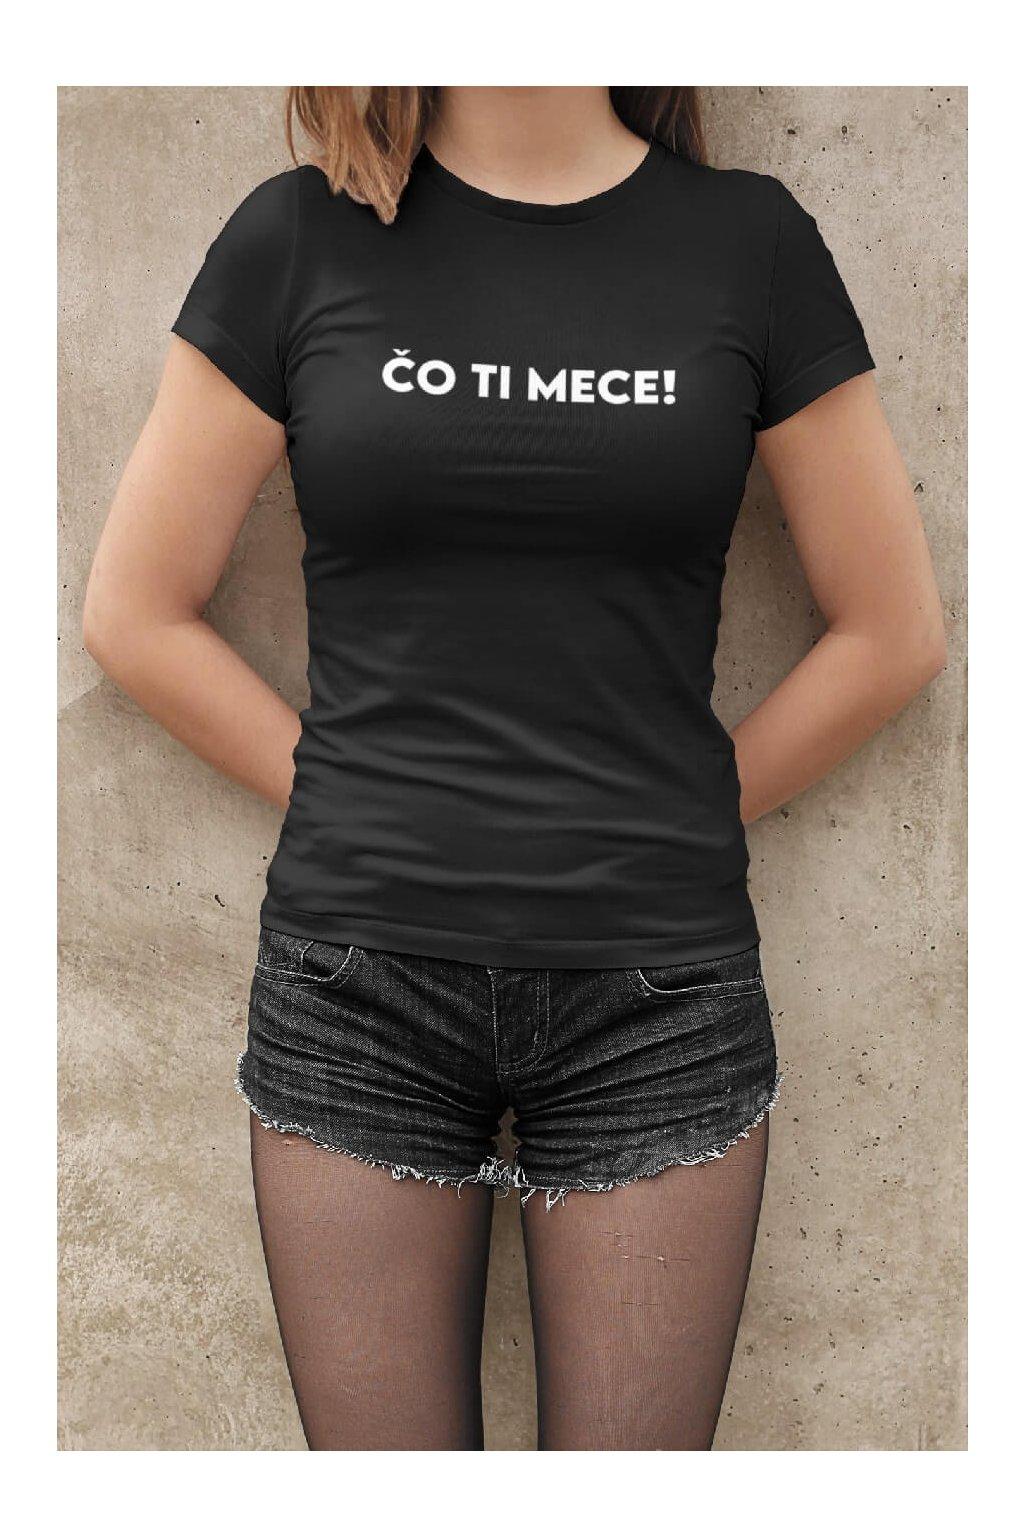 Dámske tričko Čo ti mece!